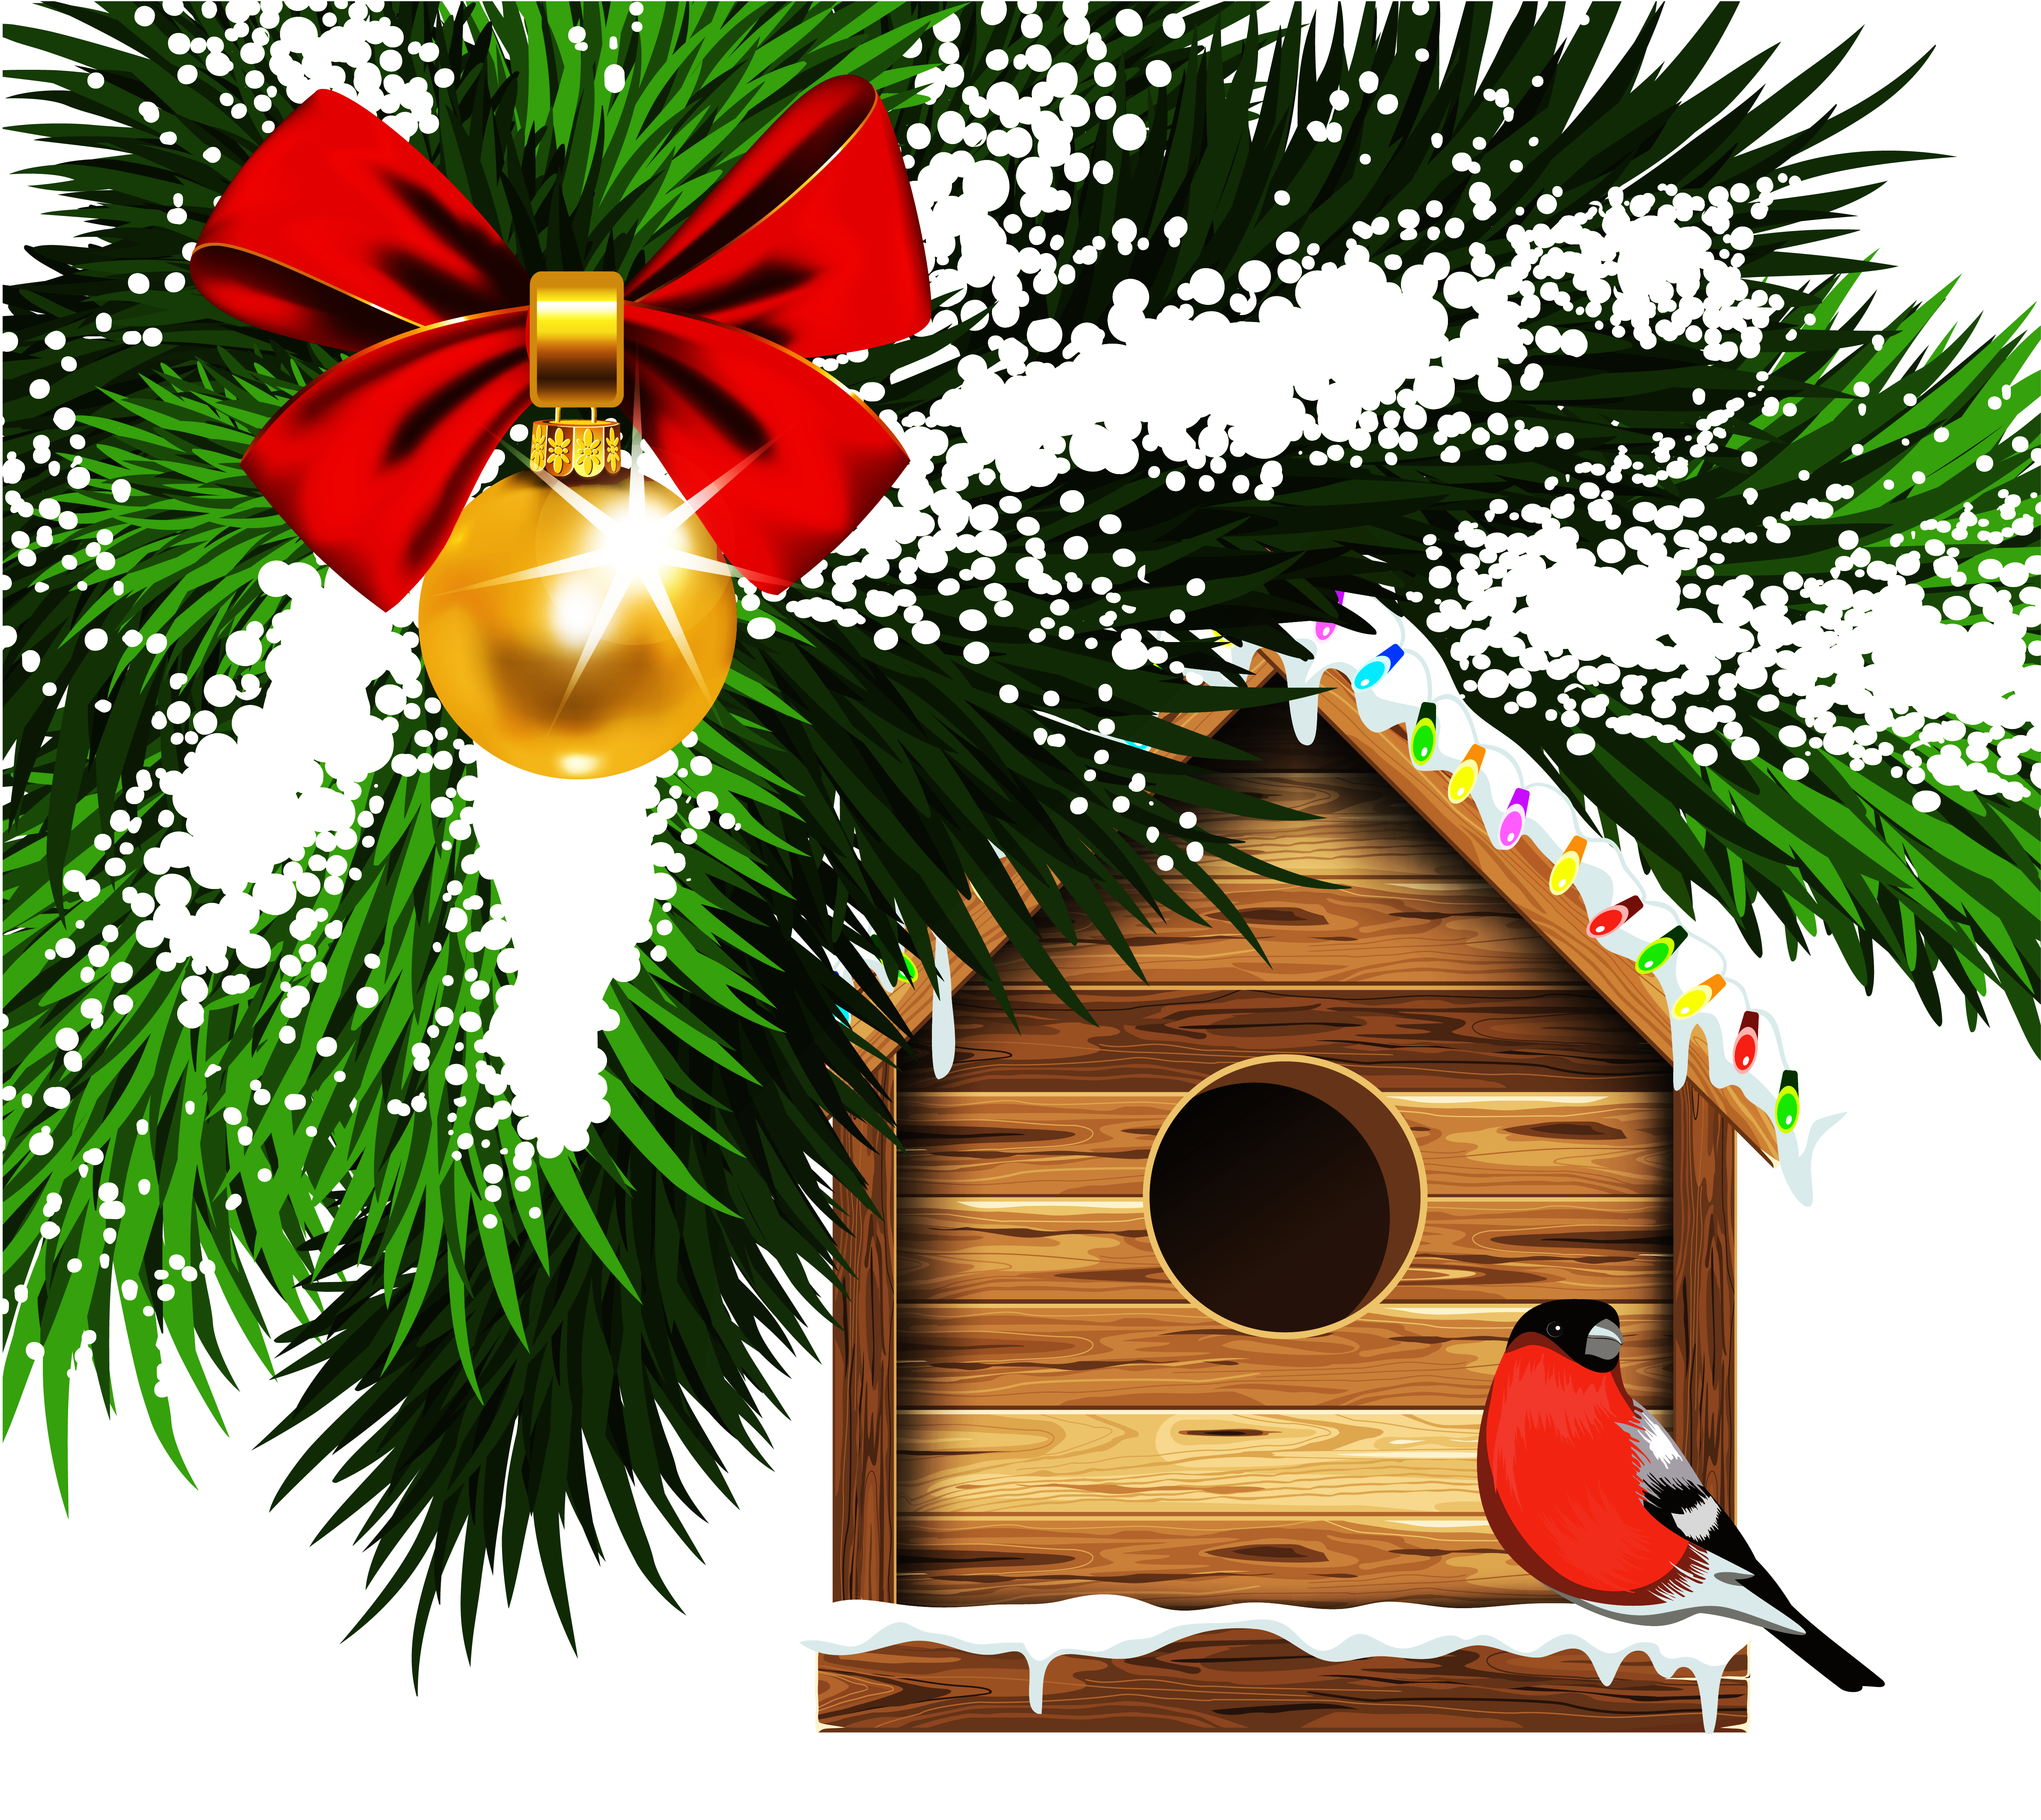 Transparent bird house png. Birdhouse clipart christmas